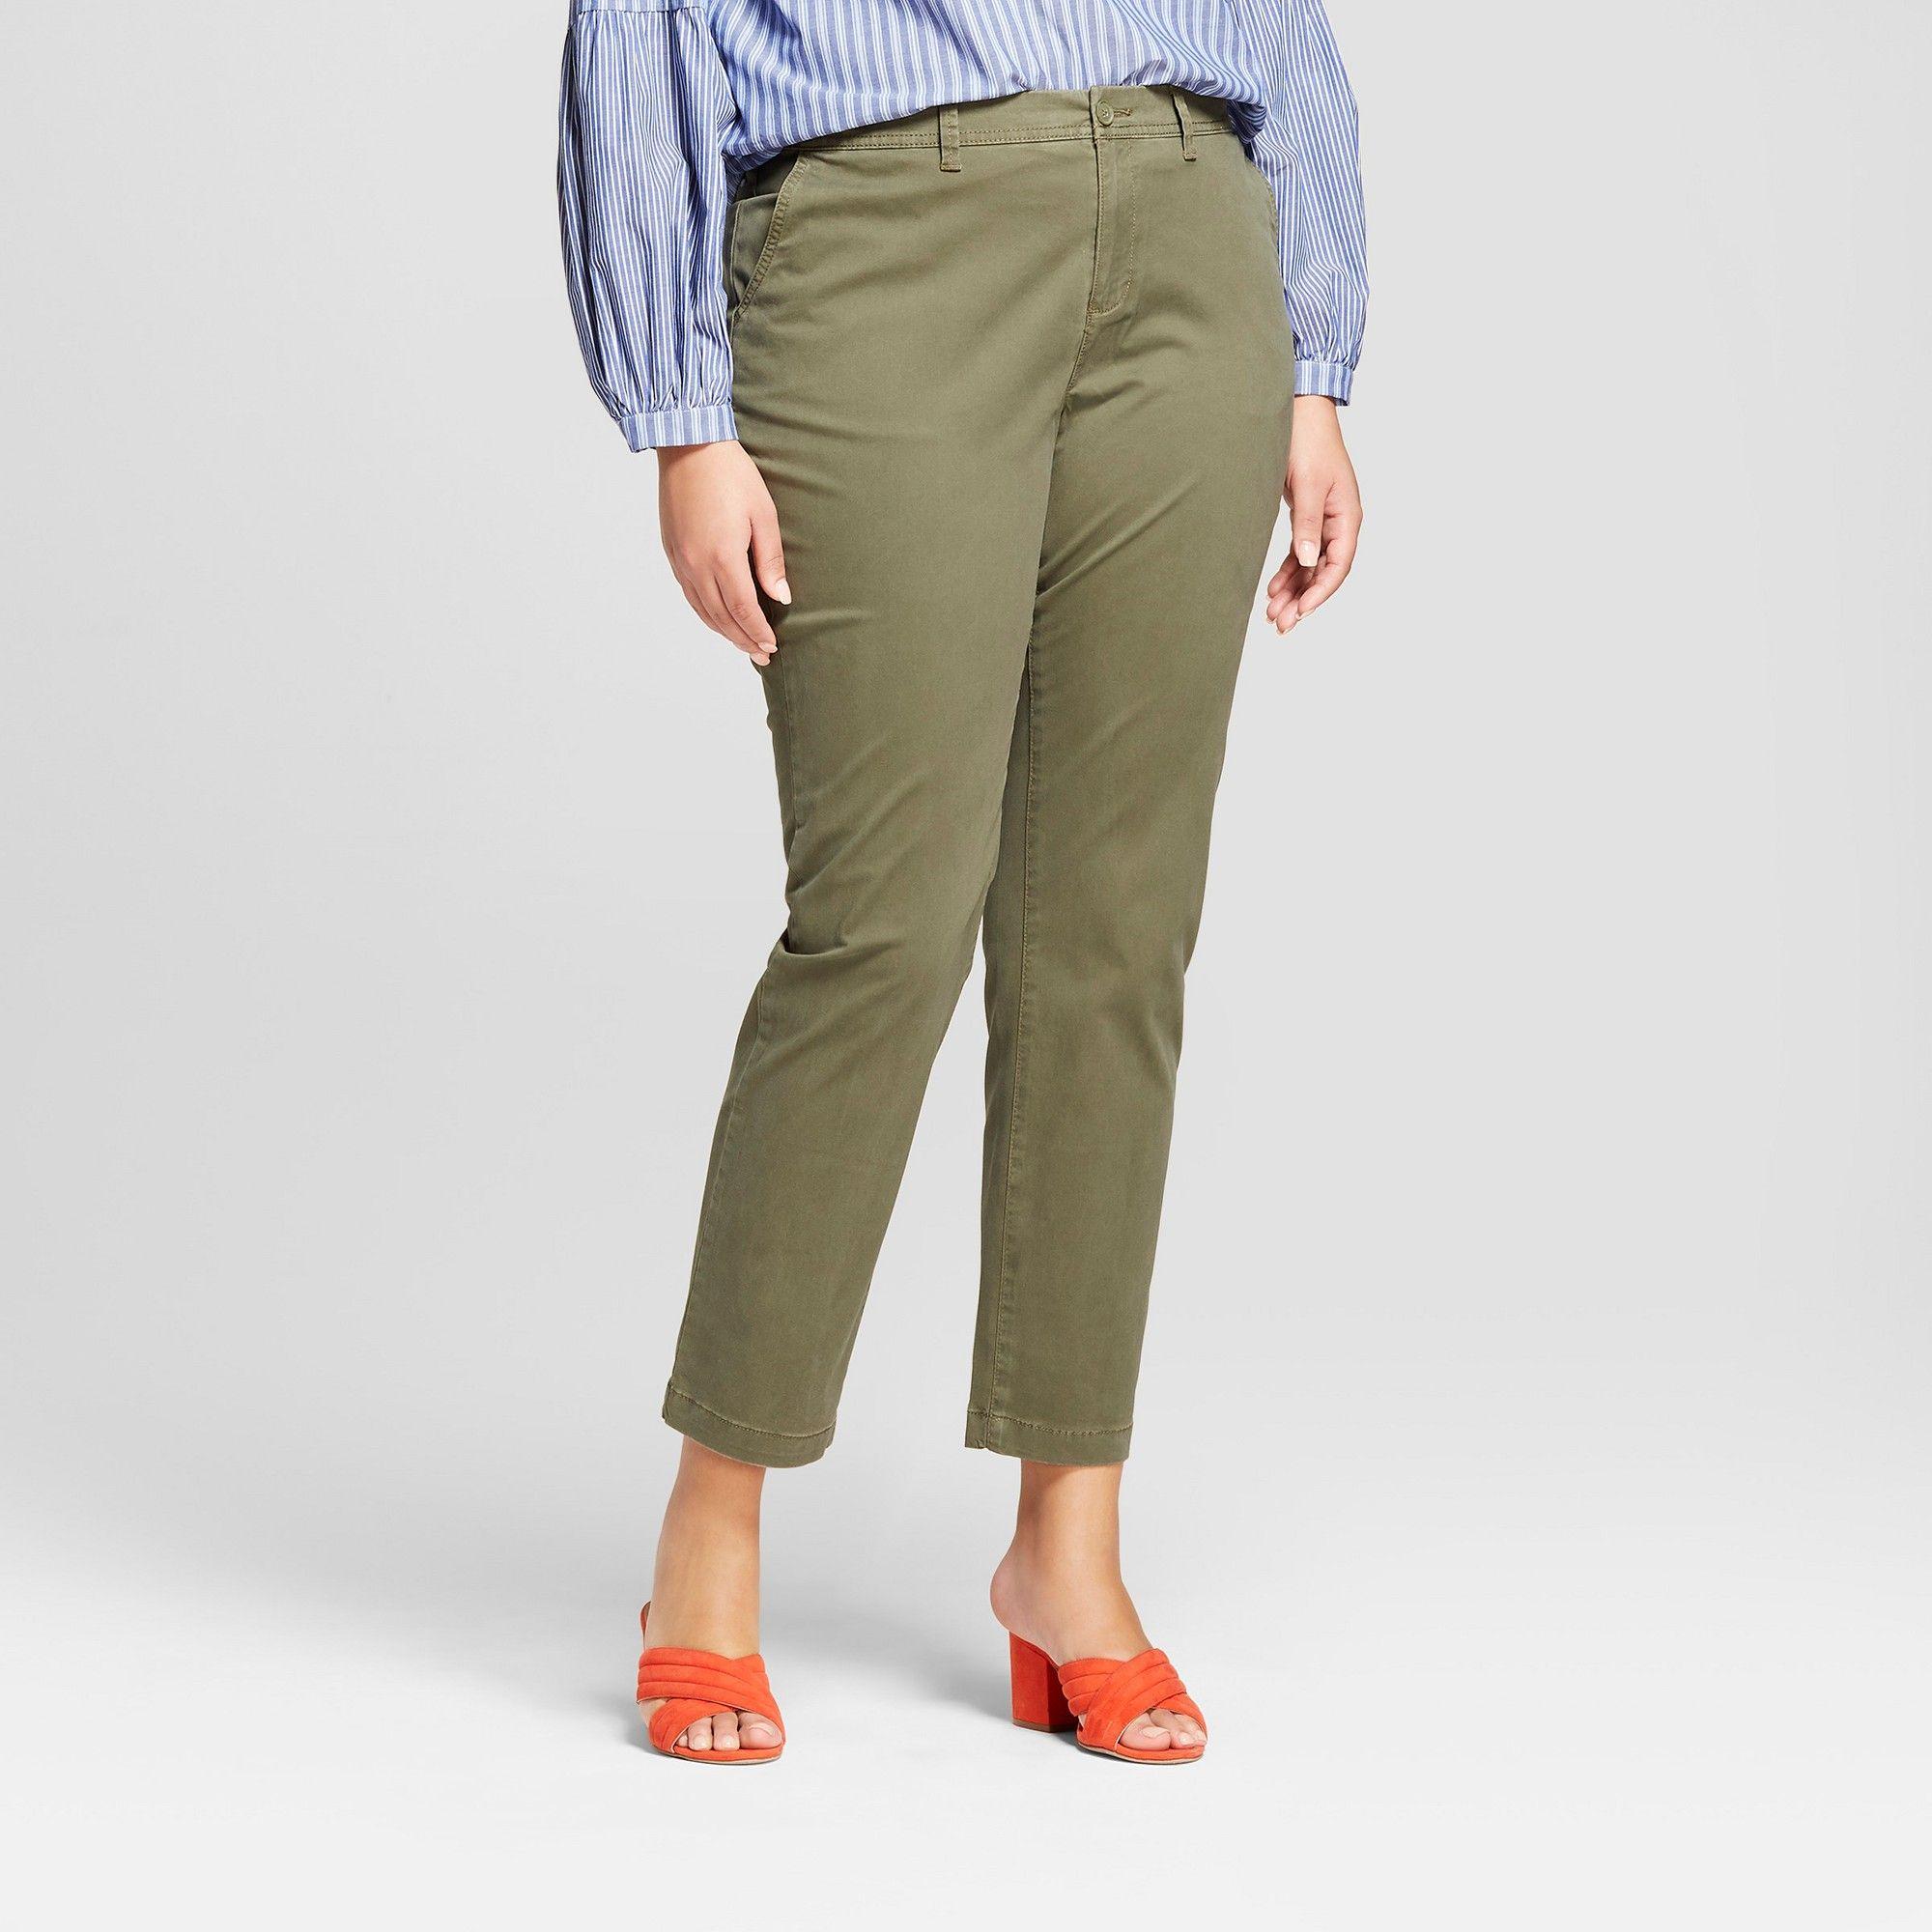 05249579e86e Women s Plus Size Slim Chino Pants - A New Day Olive (Green) 14W ...